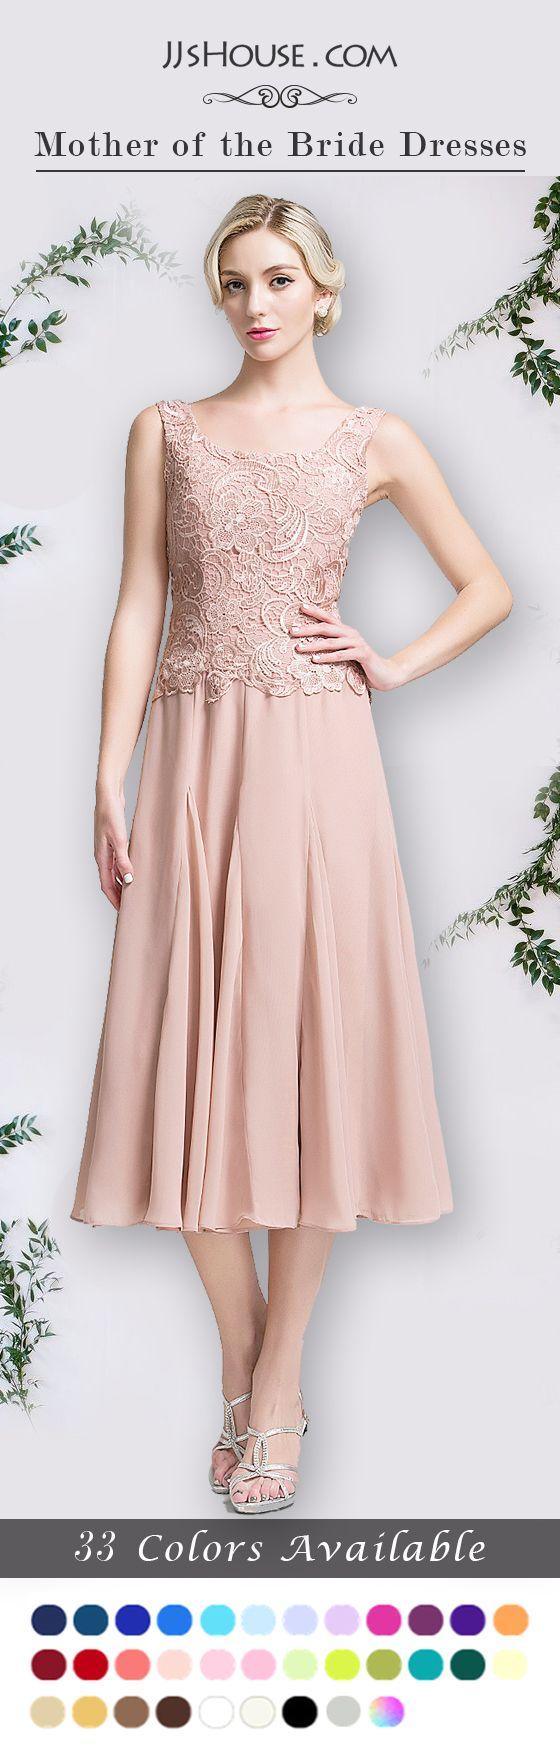 A-Line/Princess Square Neckline Tea-Length Chiffon Mother of the Bride Dress, for spring, summer & fall wear. #JJsHouse